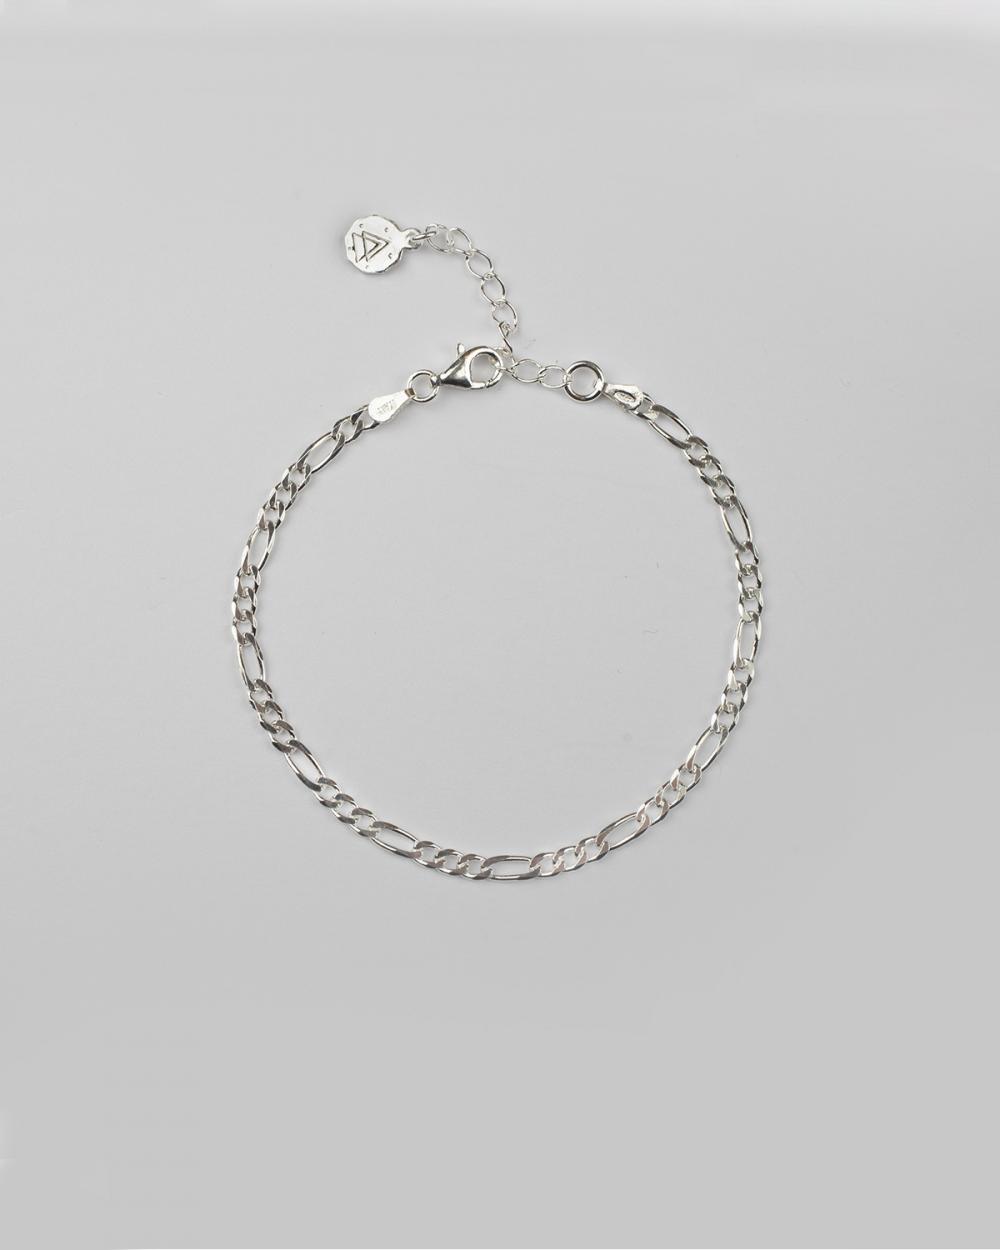 Bracelets SILVER 3+1 CURB CHAIN BRACELET NOVE25